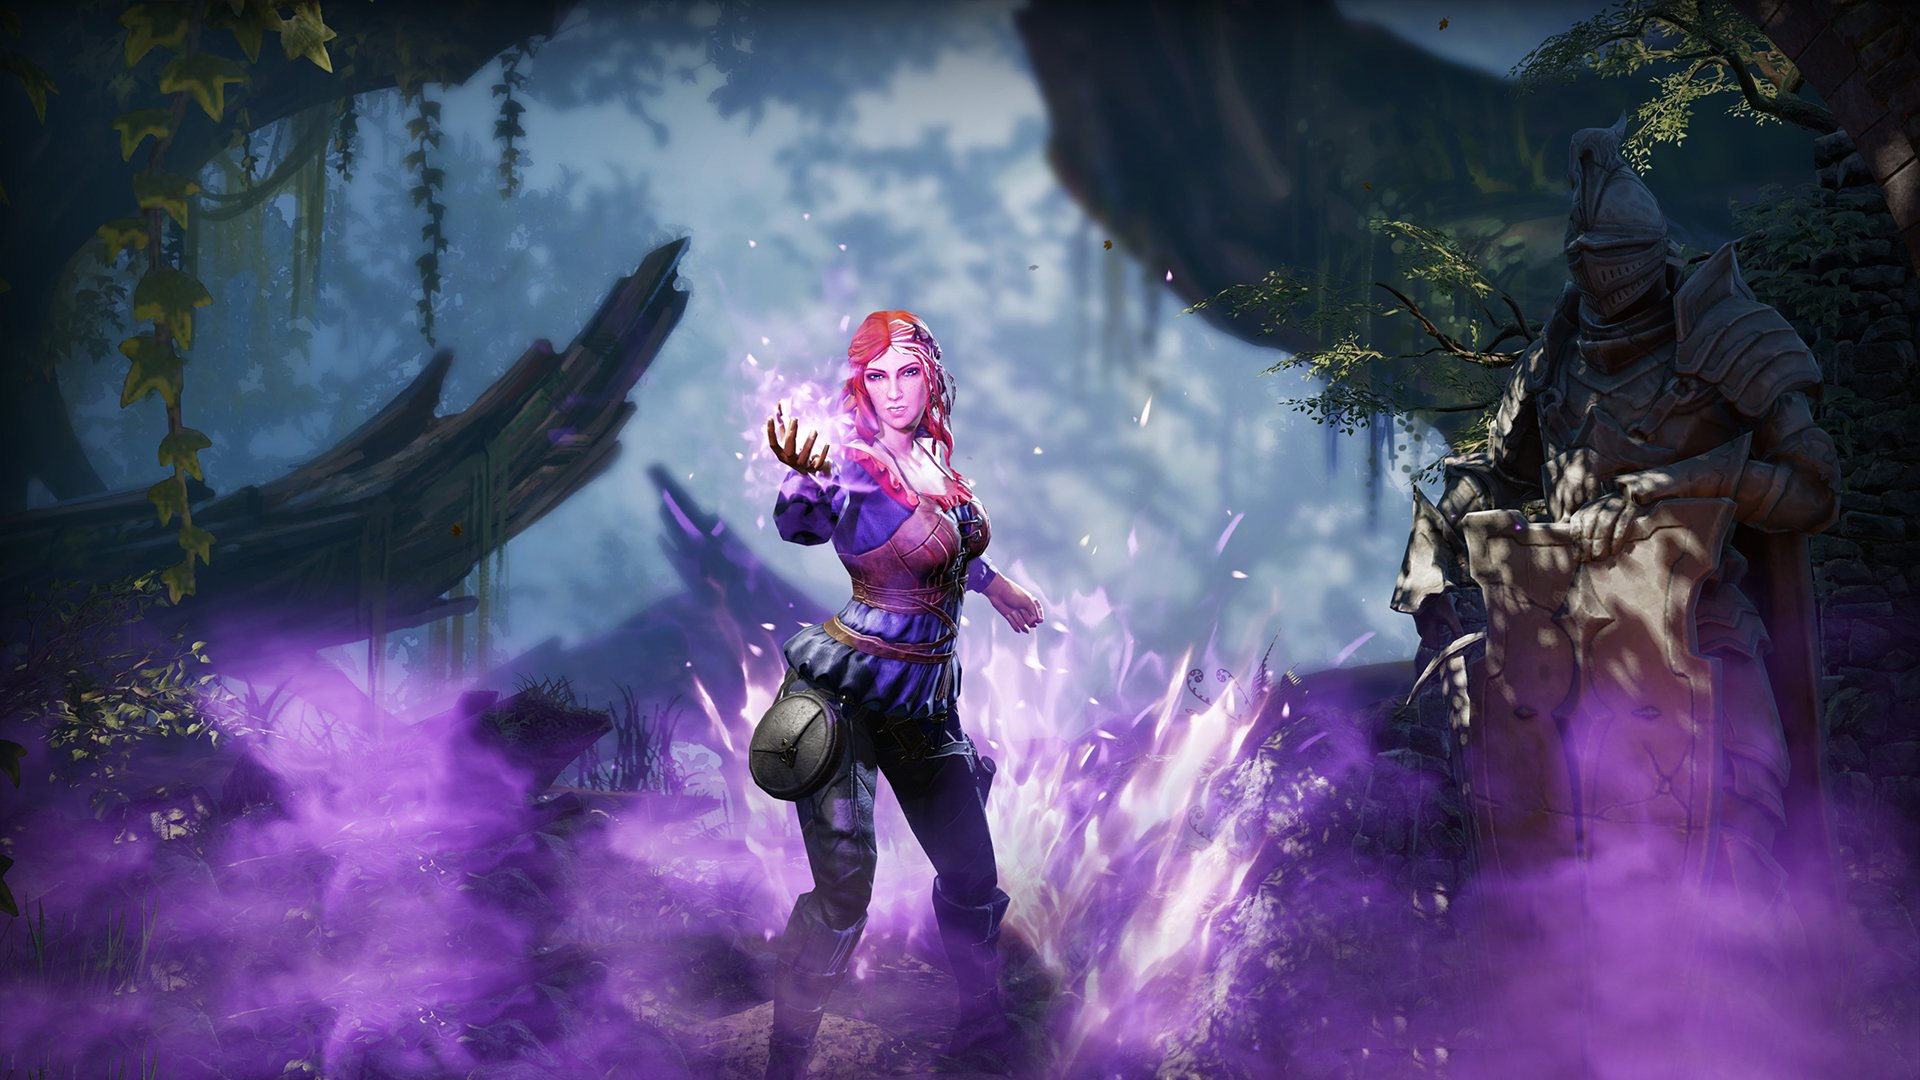 Divinity Original Sin 2 Announced For Consoles